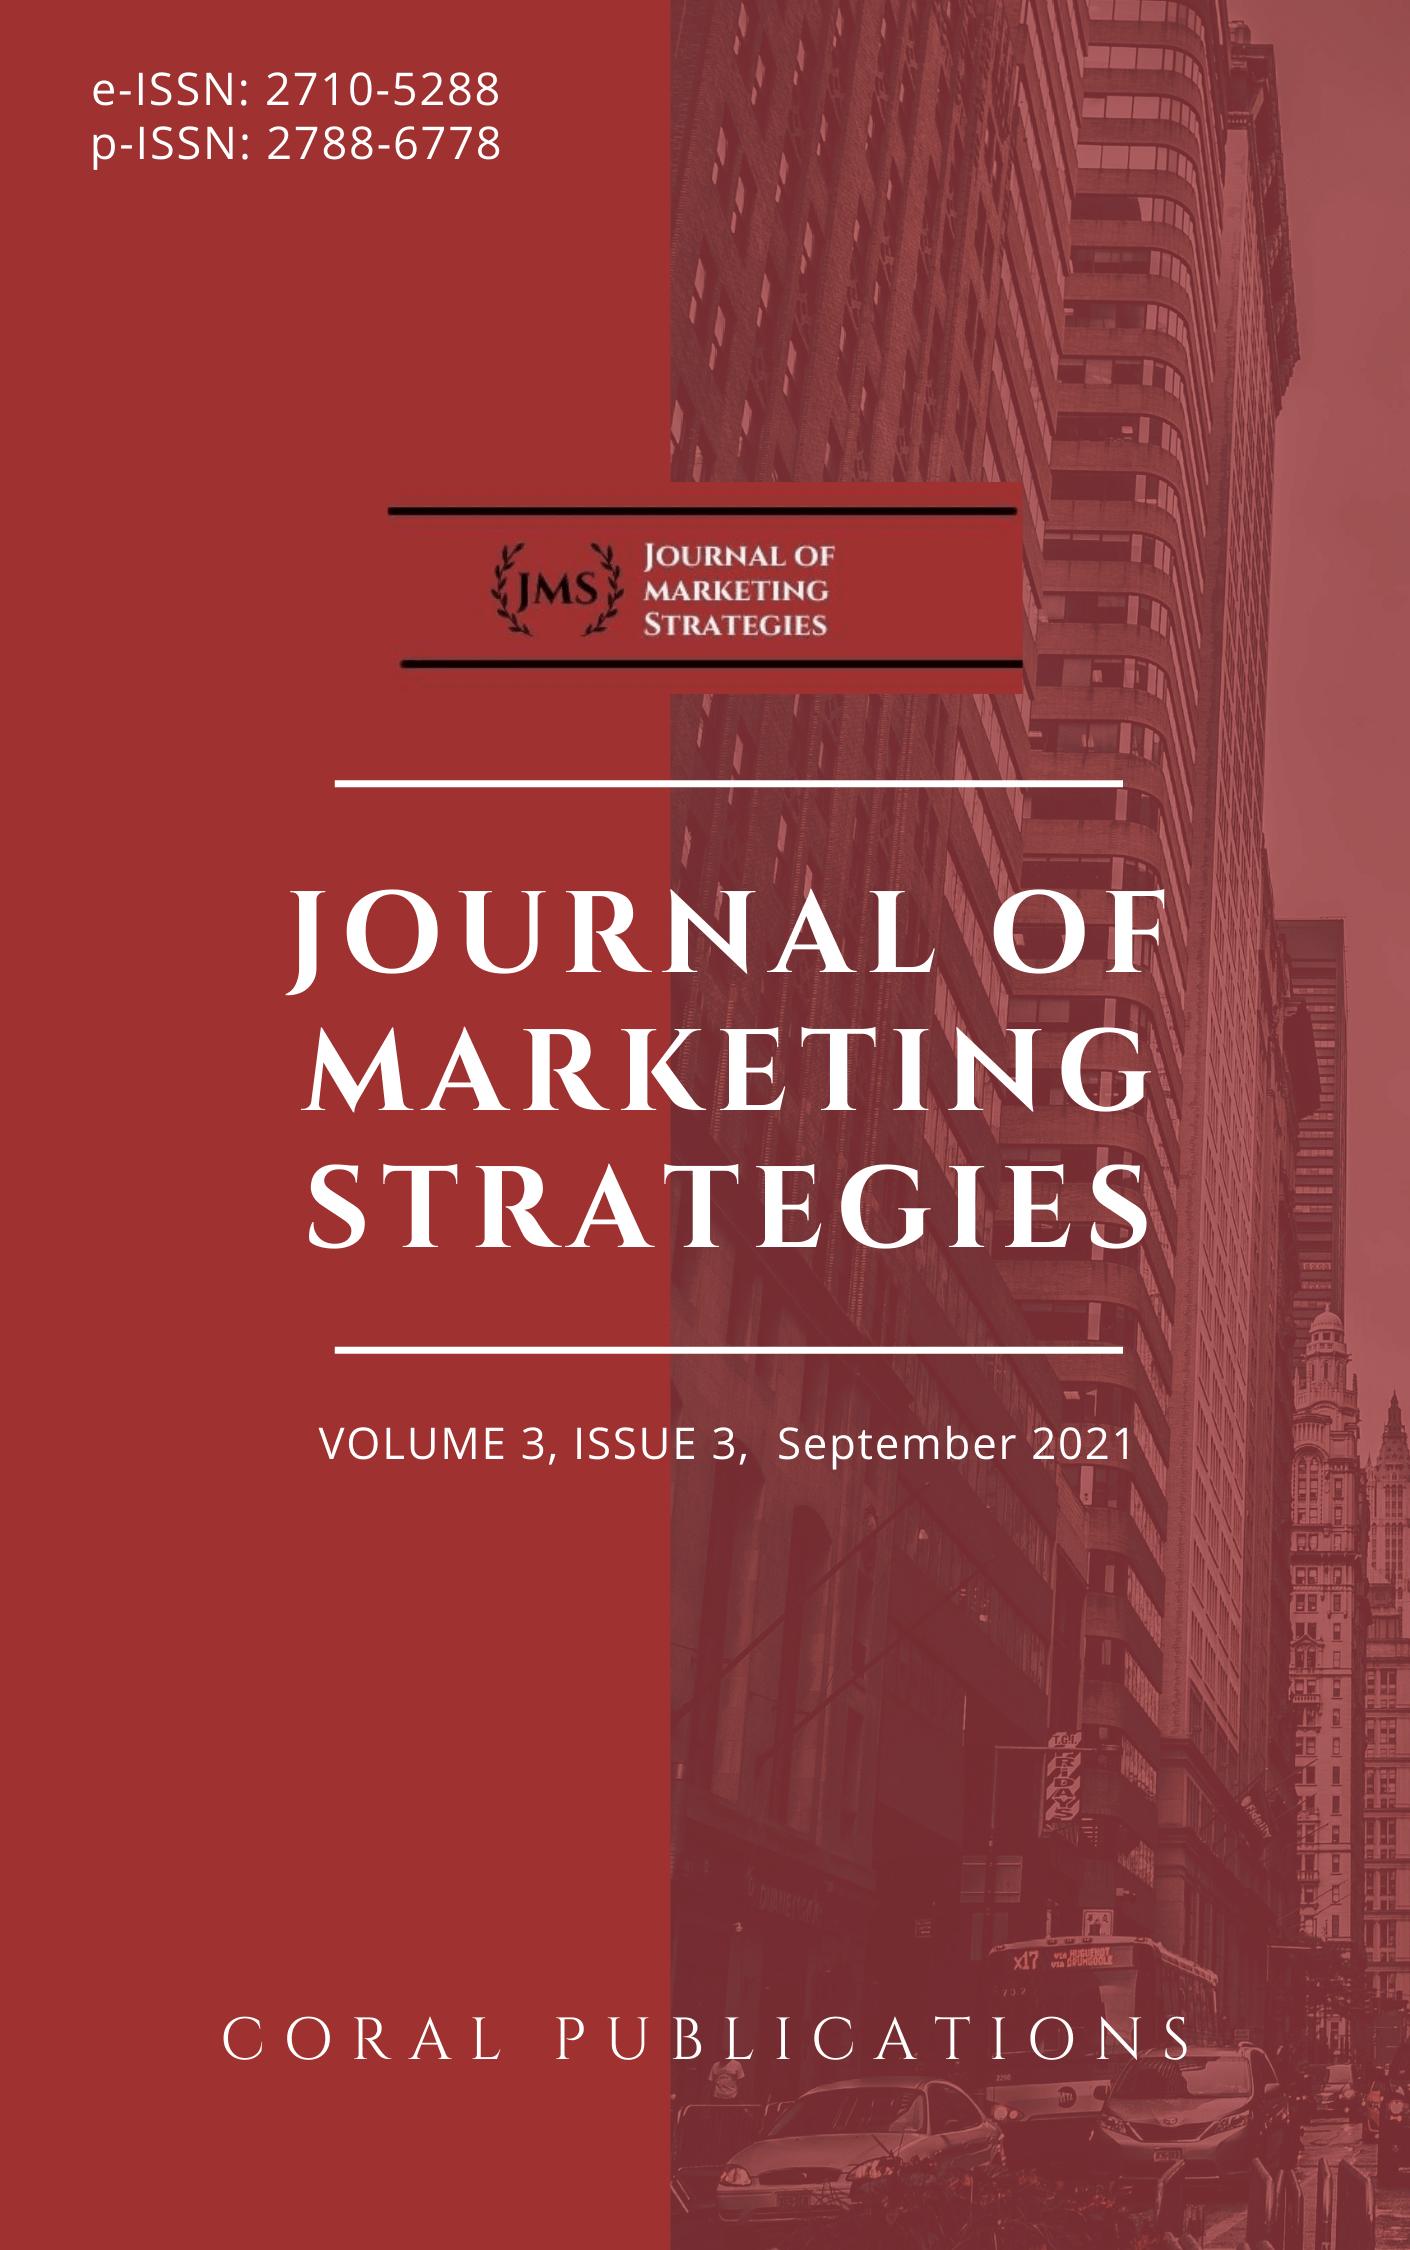 View Vol. 3 No. 3 (2021): Journal of Marketing Strategies September 2021